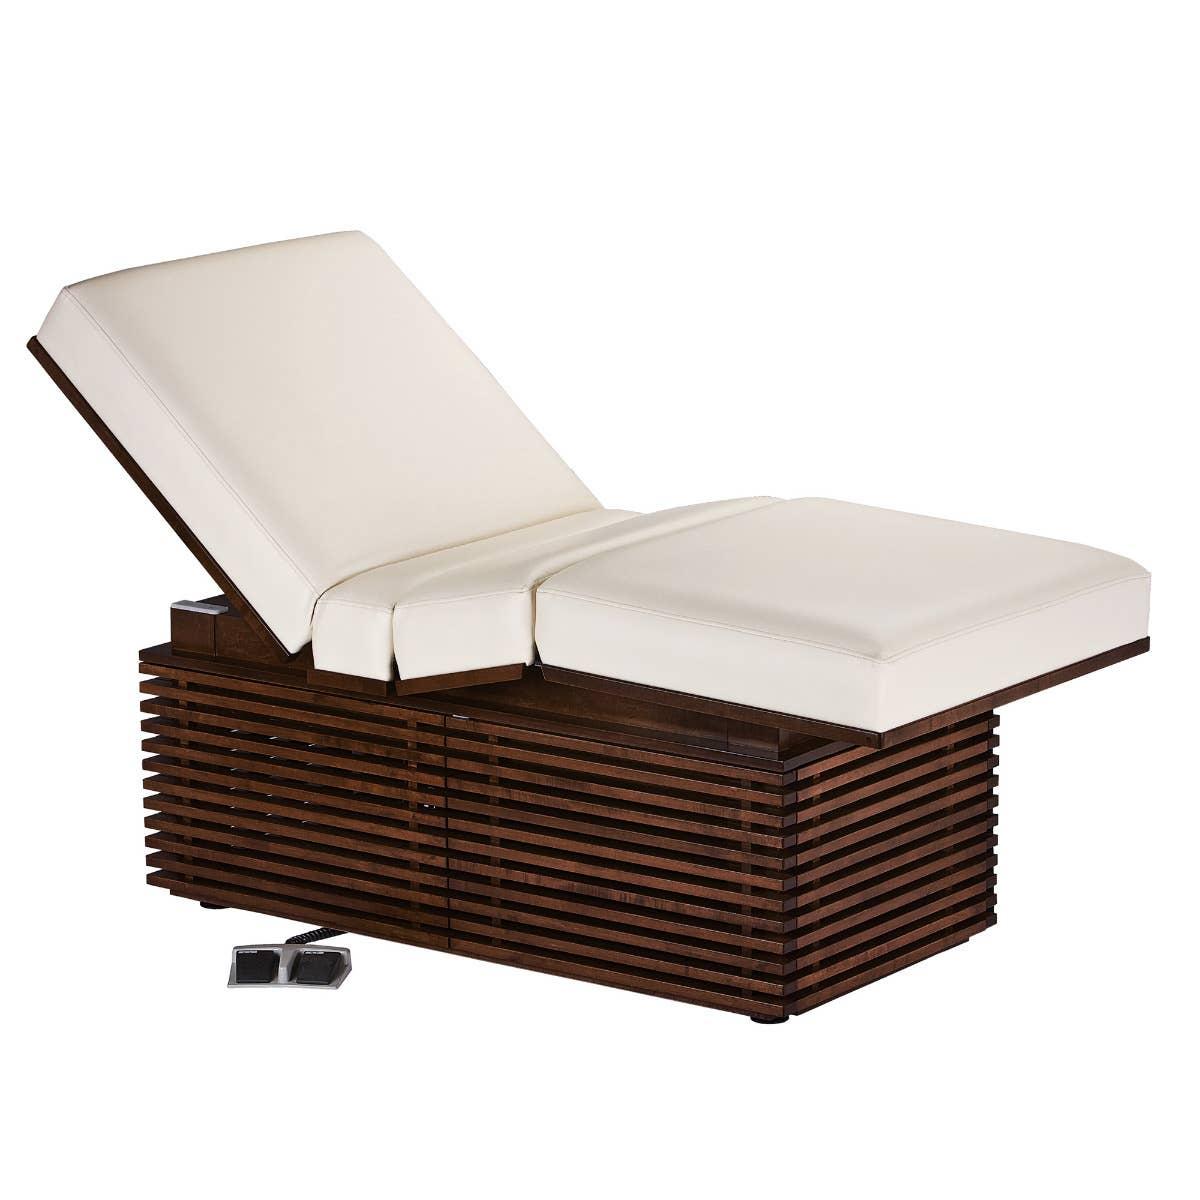 treatment-table_multipurpose_pro-salon-modern_03